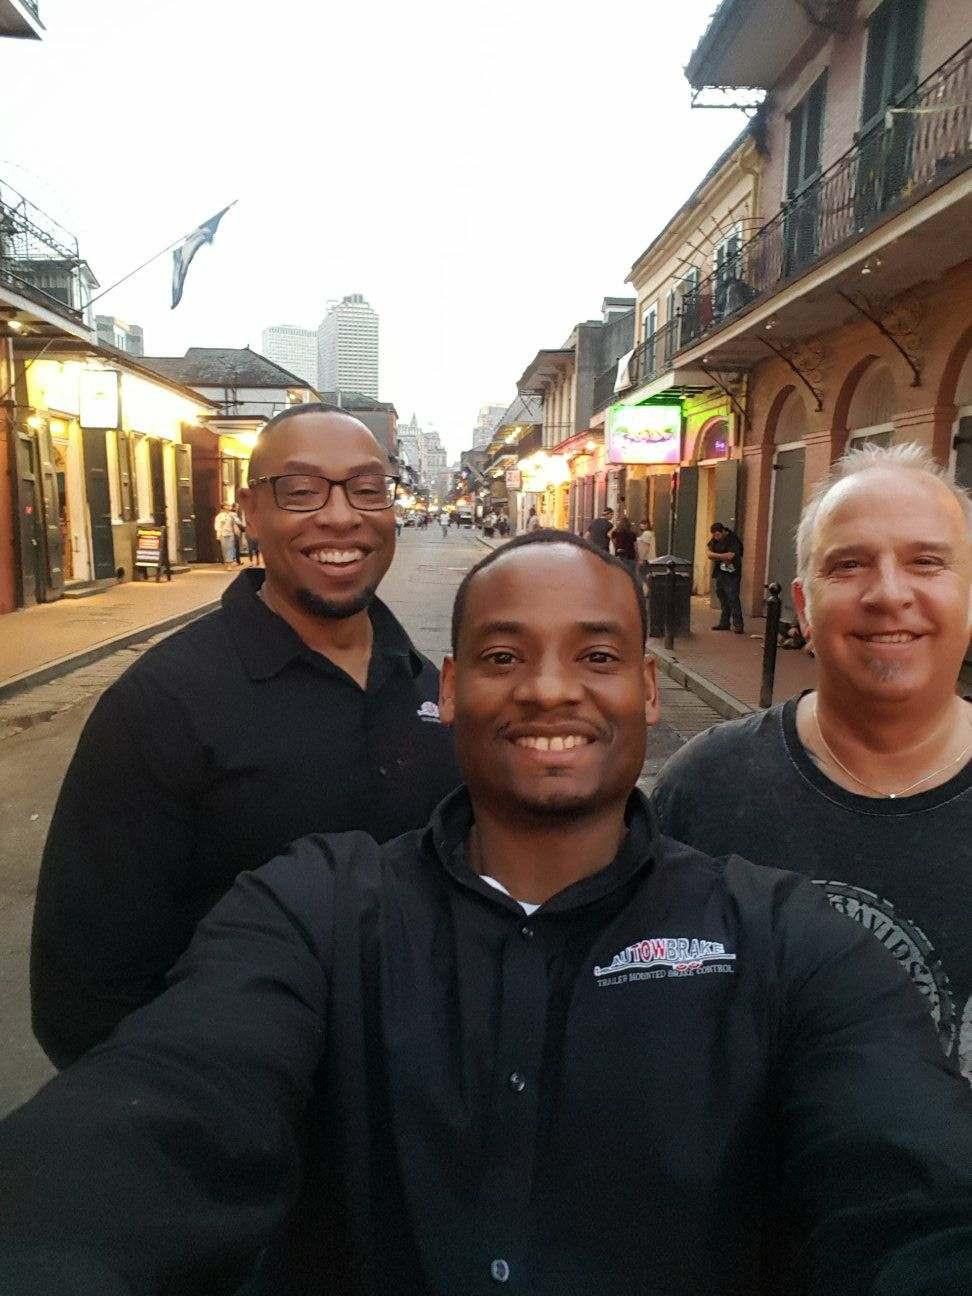 The three main employees of Autowbrake, Carlton, Chris and Byron